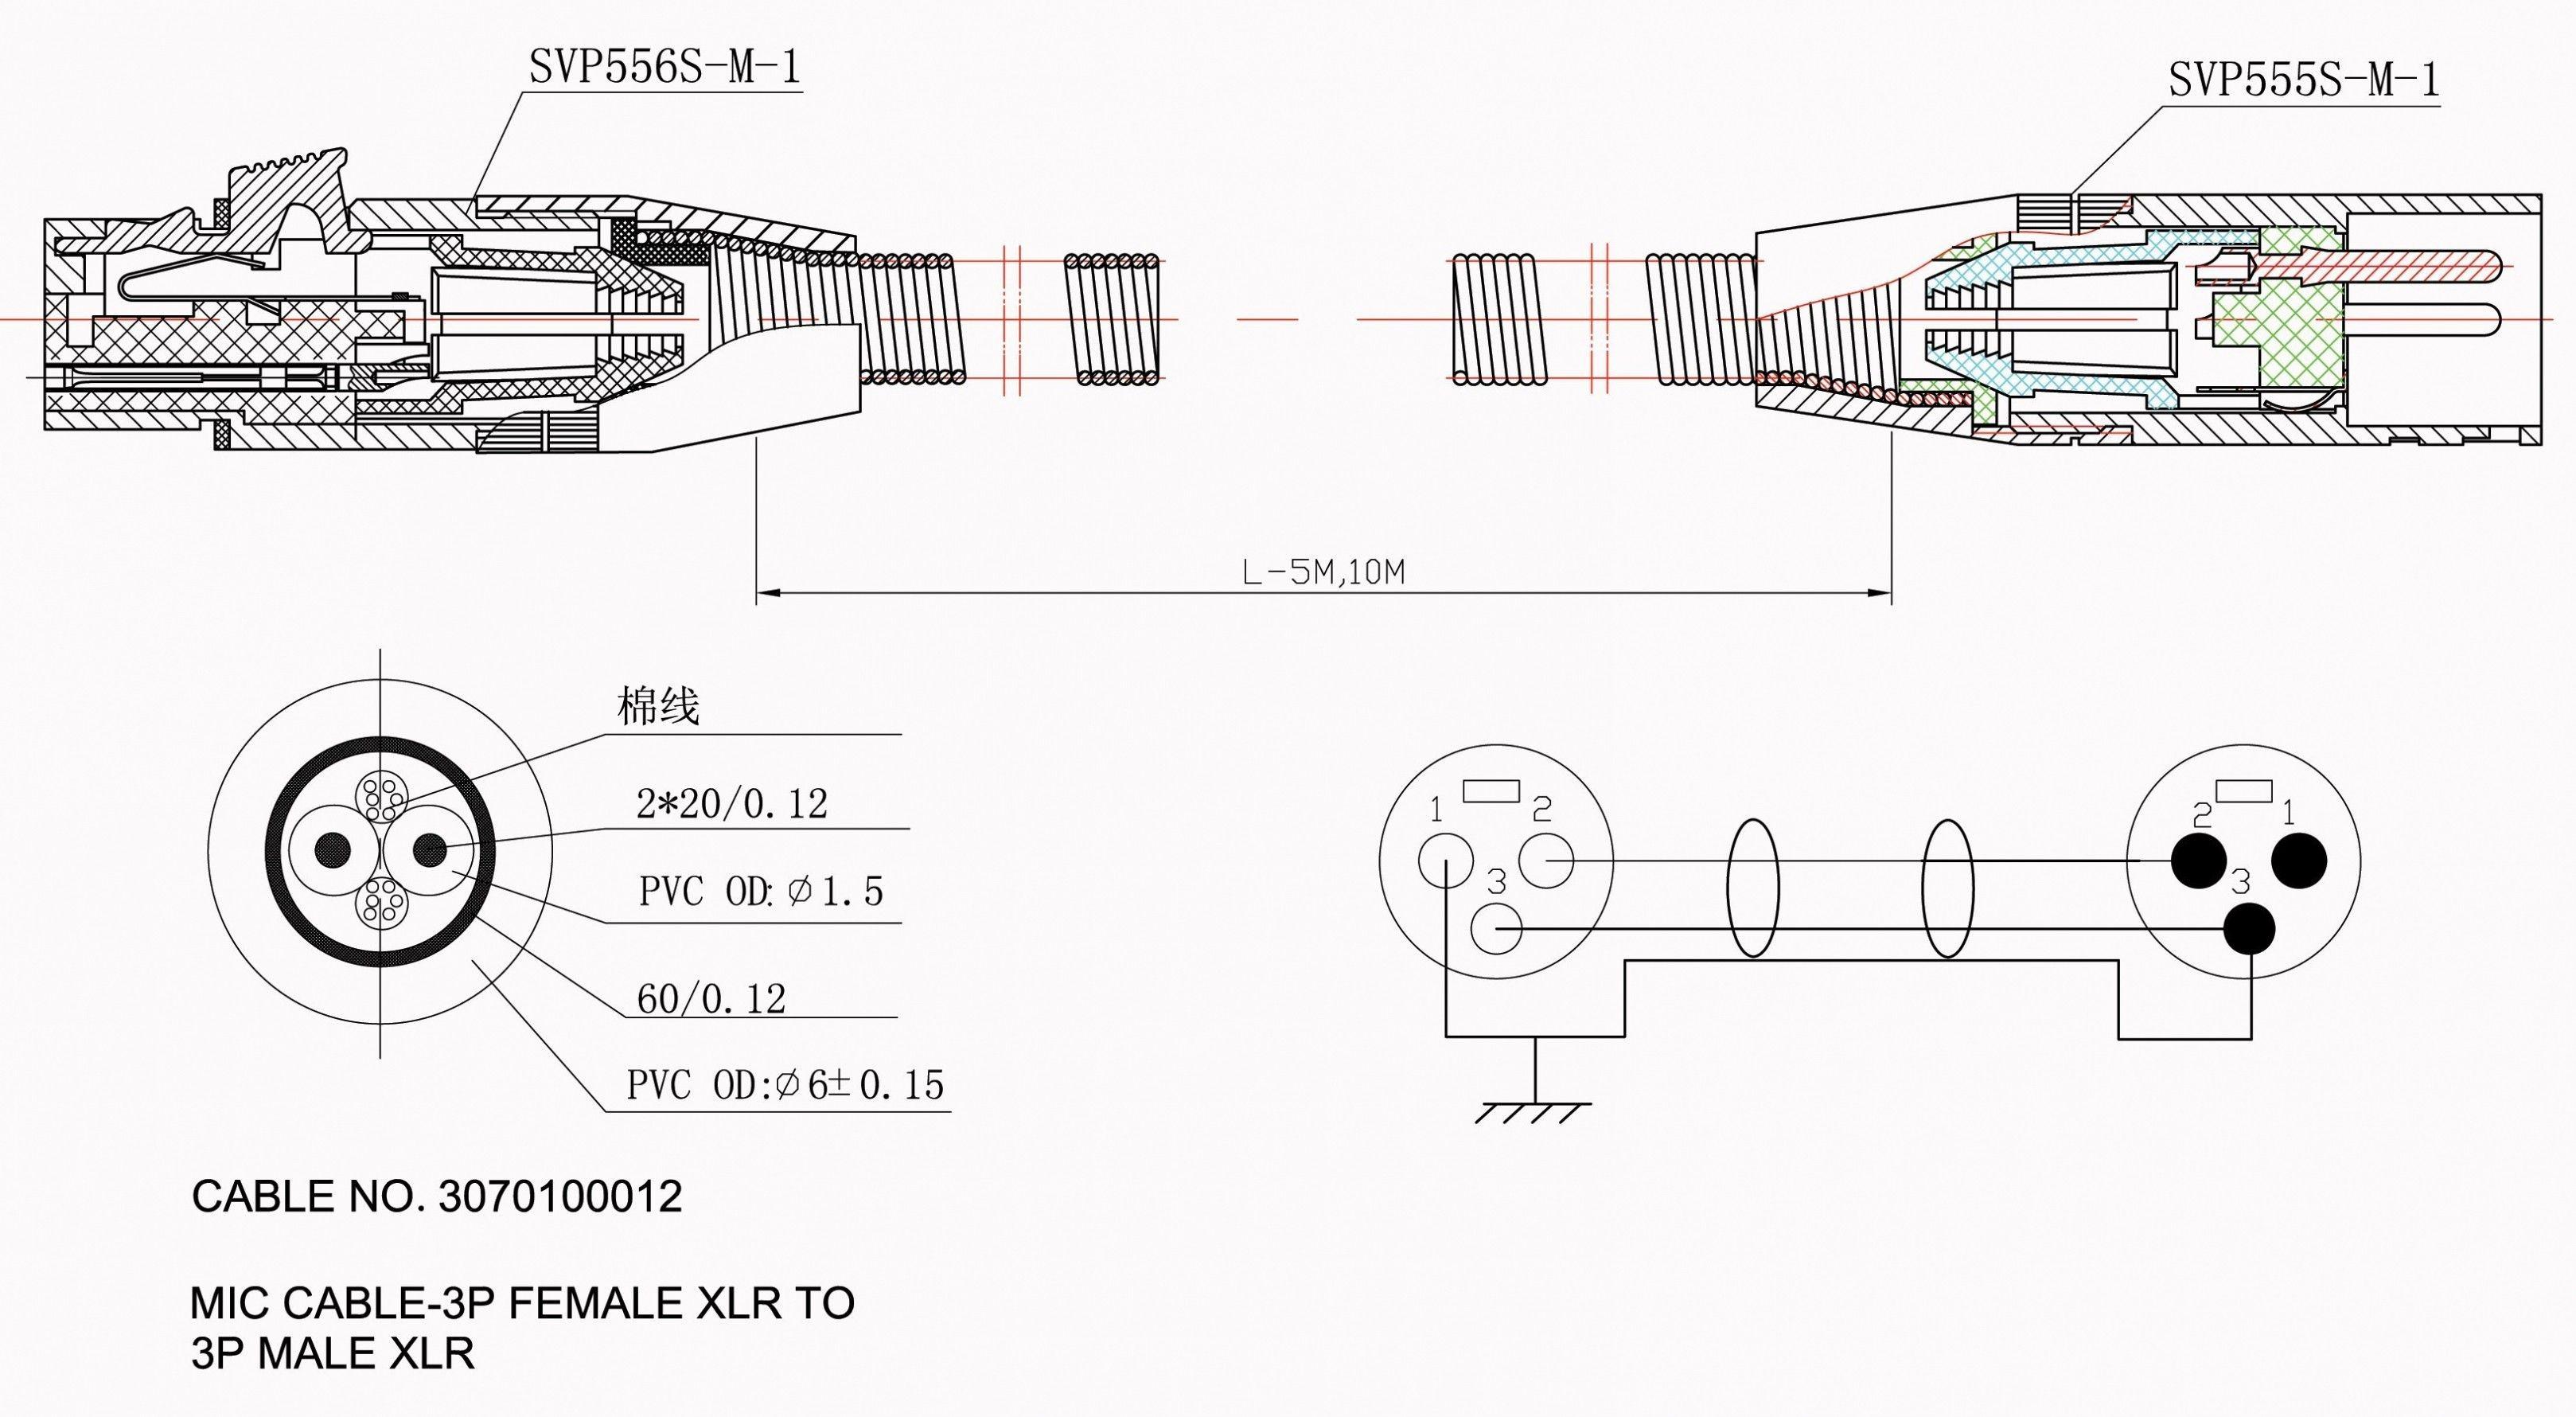 Briggs and Stratton Alternator Wiring Diagram Best E46 Alternator Wiring Diagram Diagrams Of Briggs and Stratton Alternator Wiring Diagram